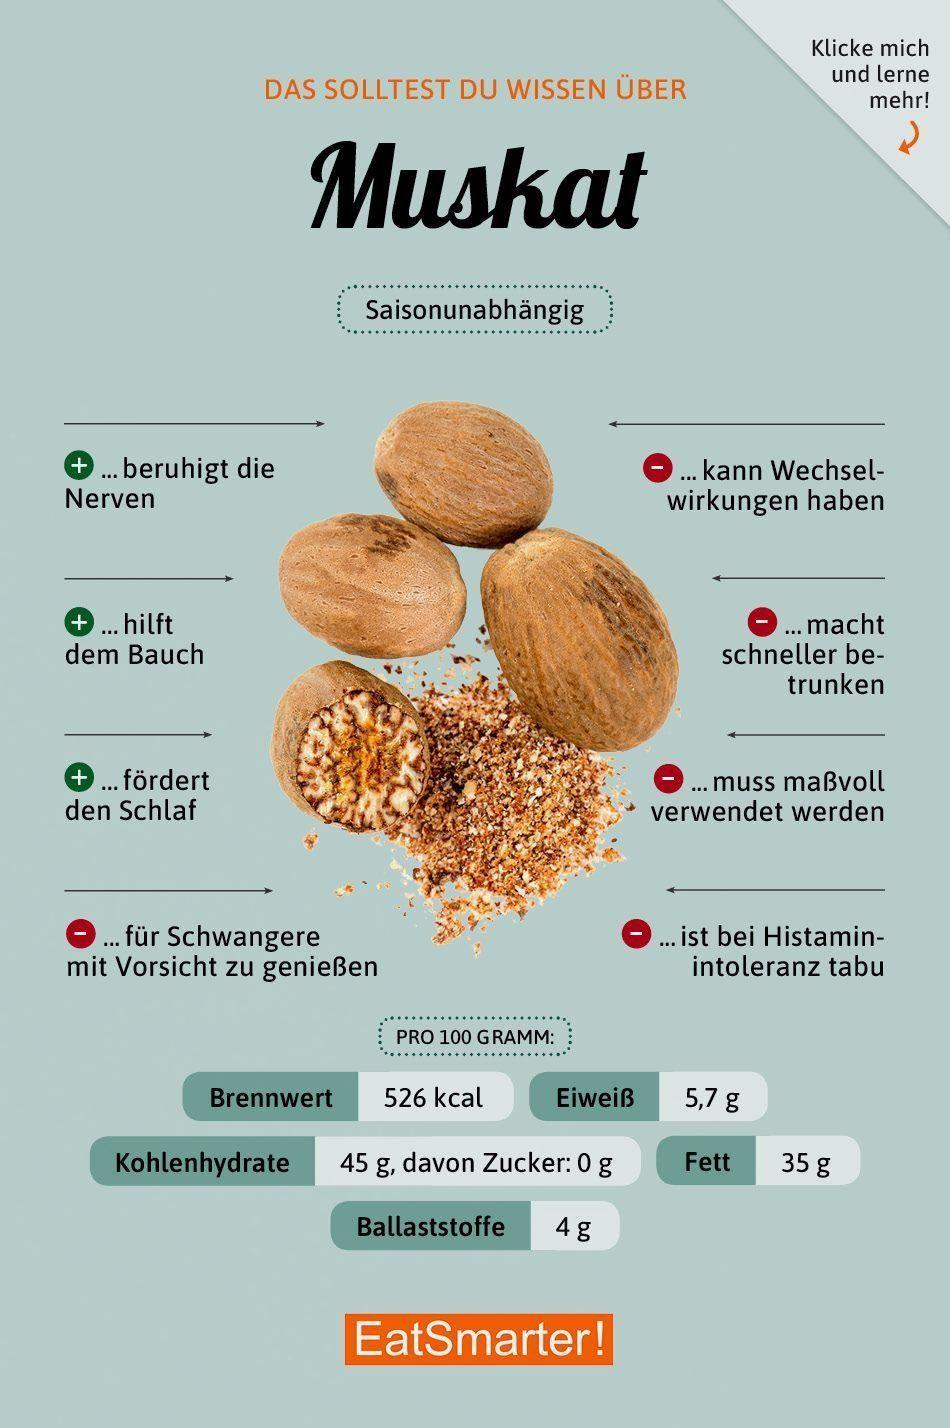 Muskat Vitamins Das Solltest Du Uber Muskat Wissen Eatsmarter De Ernahrun Fakten Gesundheit Gesundheitfakten Infografik In 2020 Histamin Gesundheit